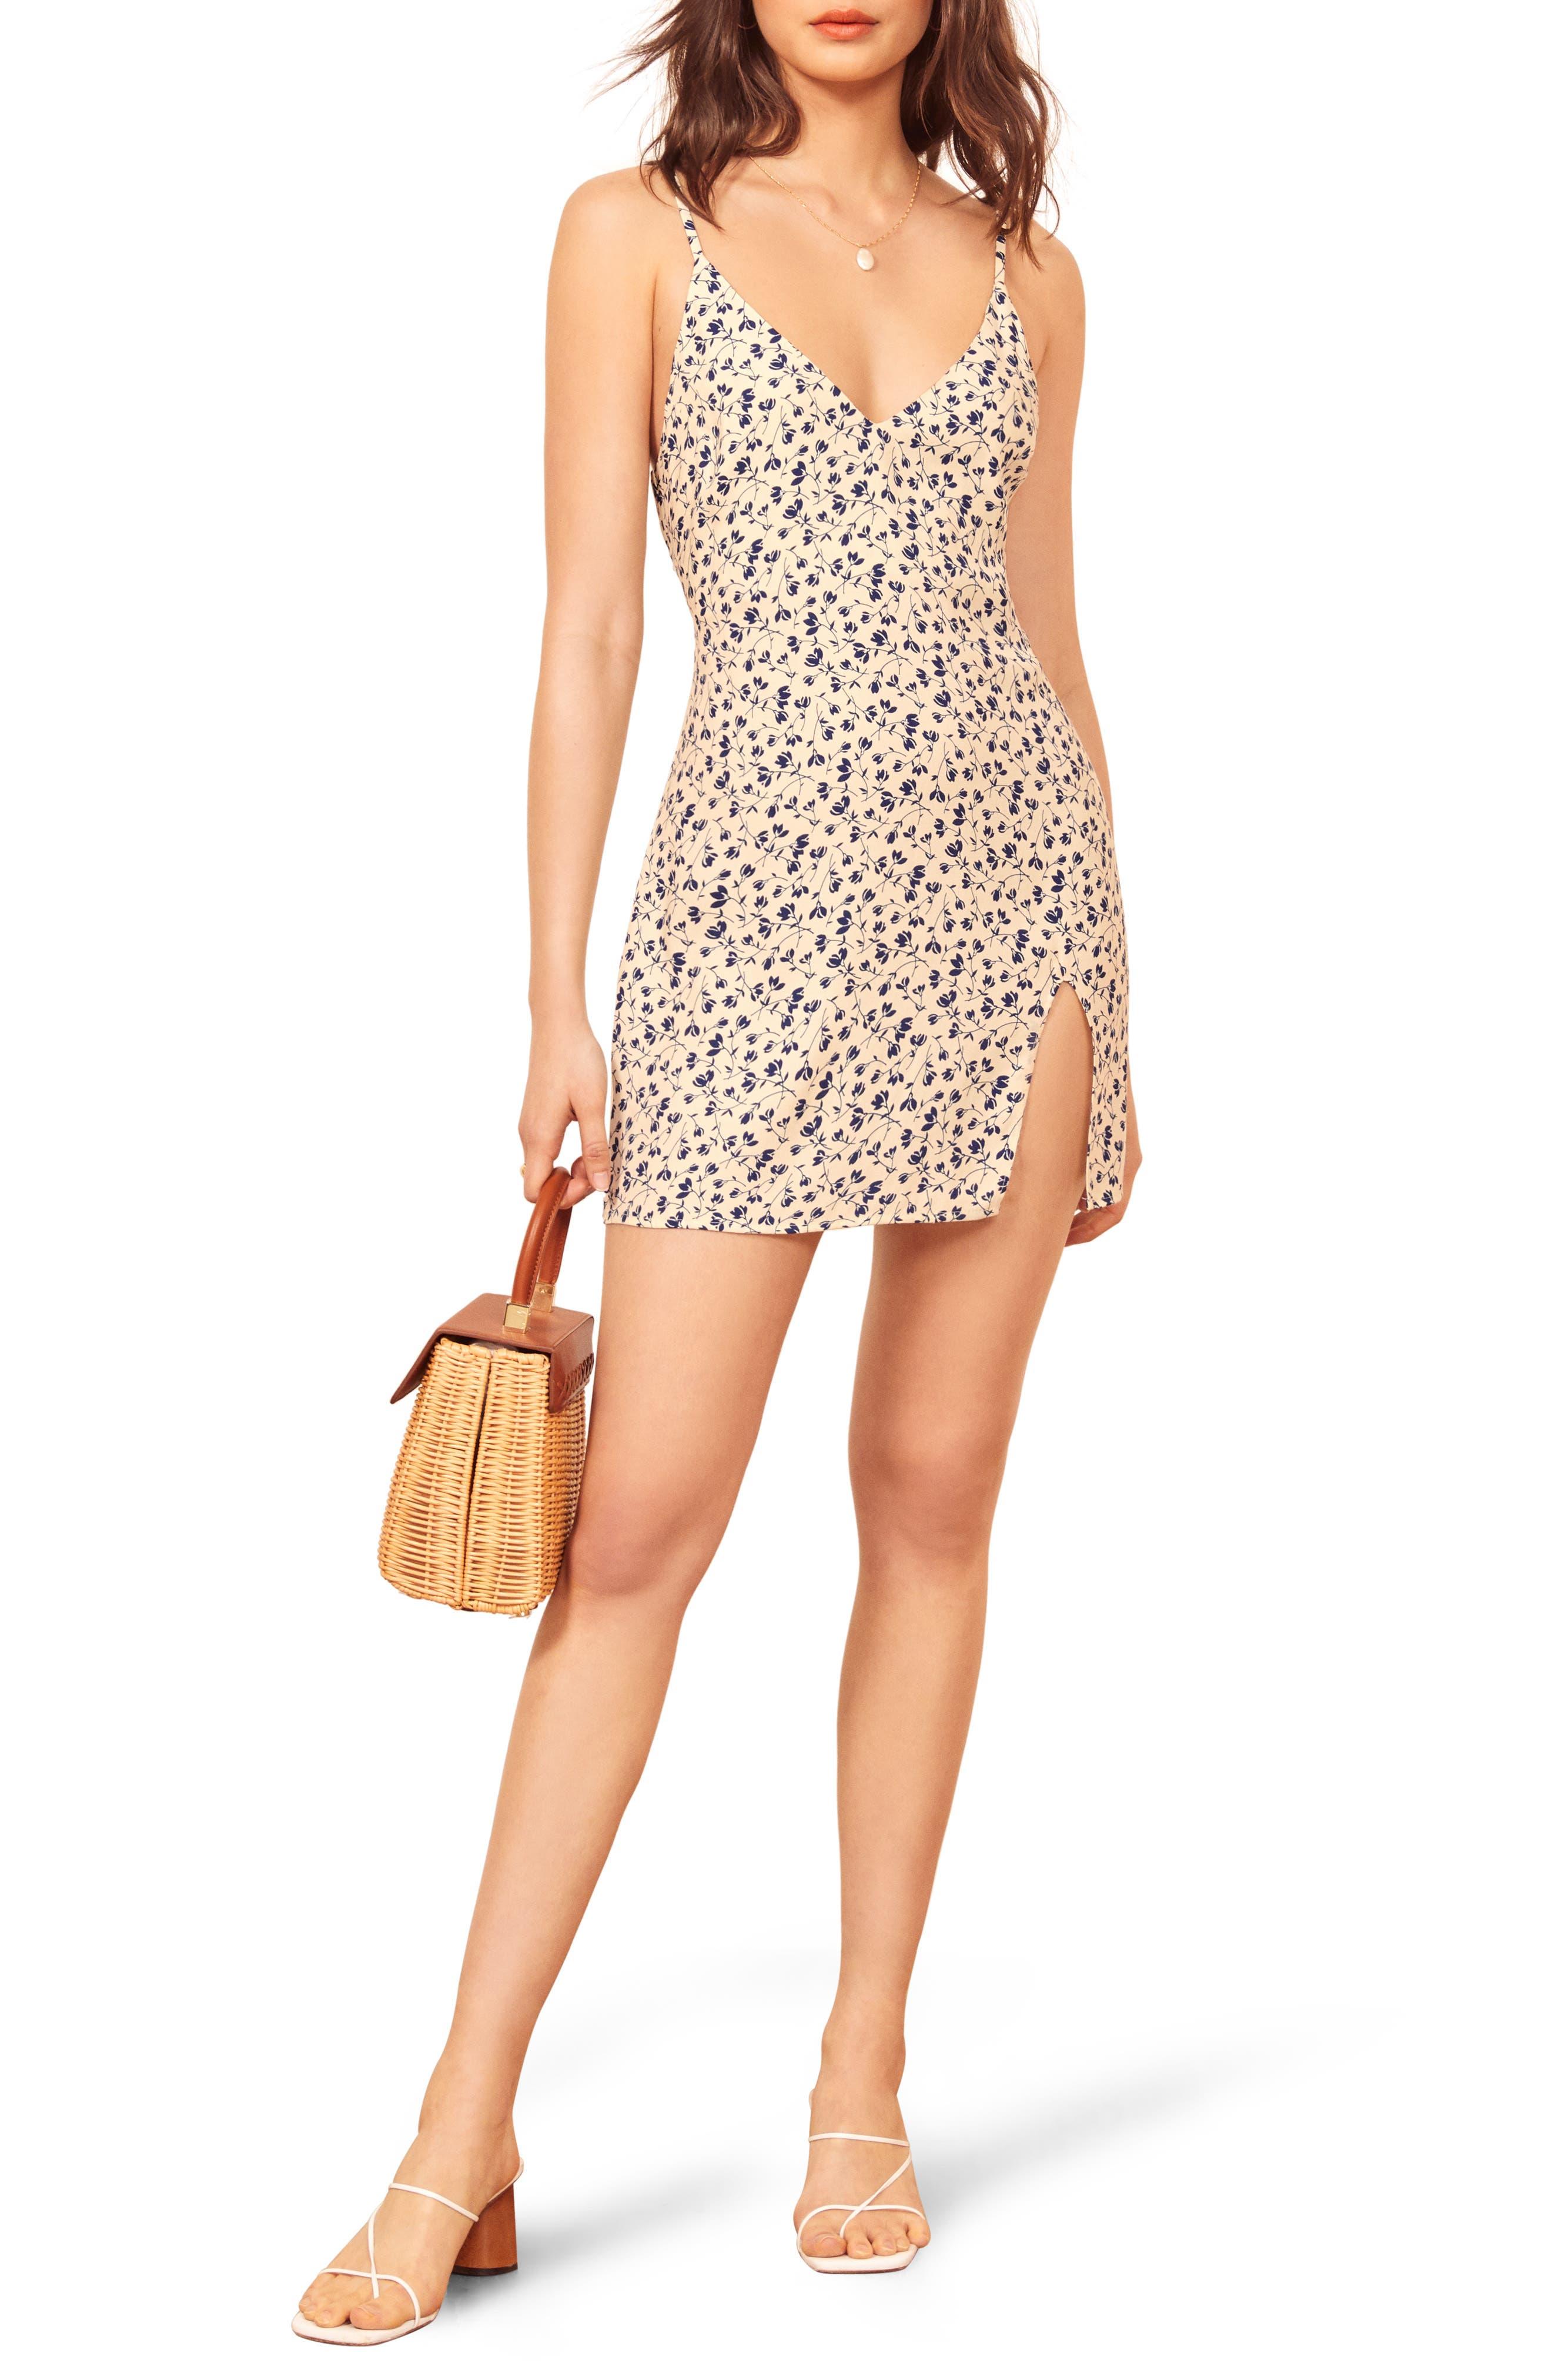 Reformation Marlowe Sleeveless Minidress, White